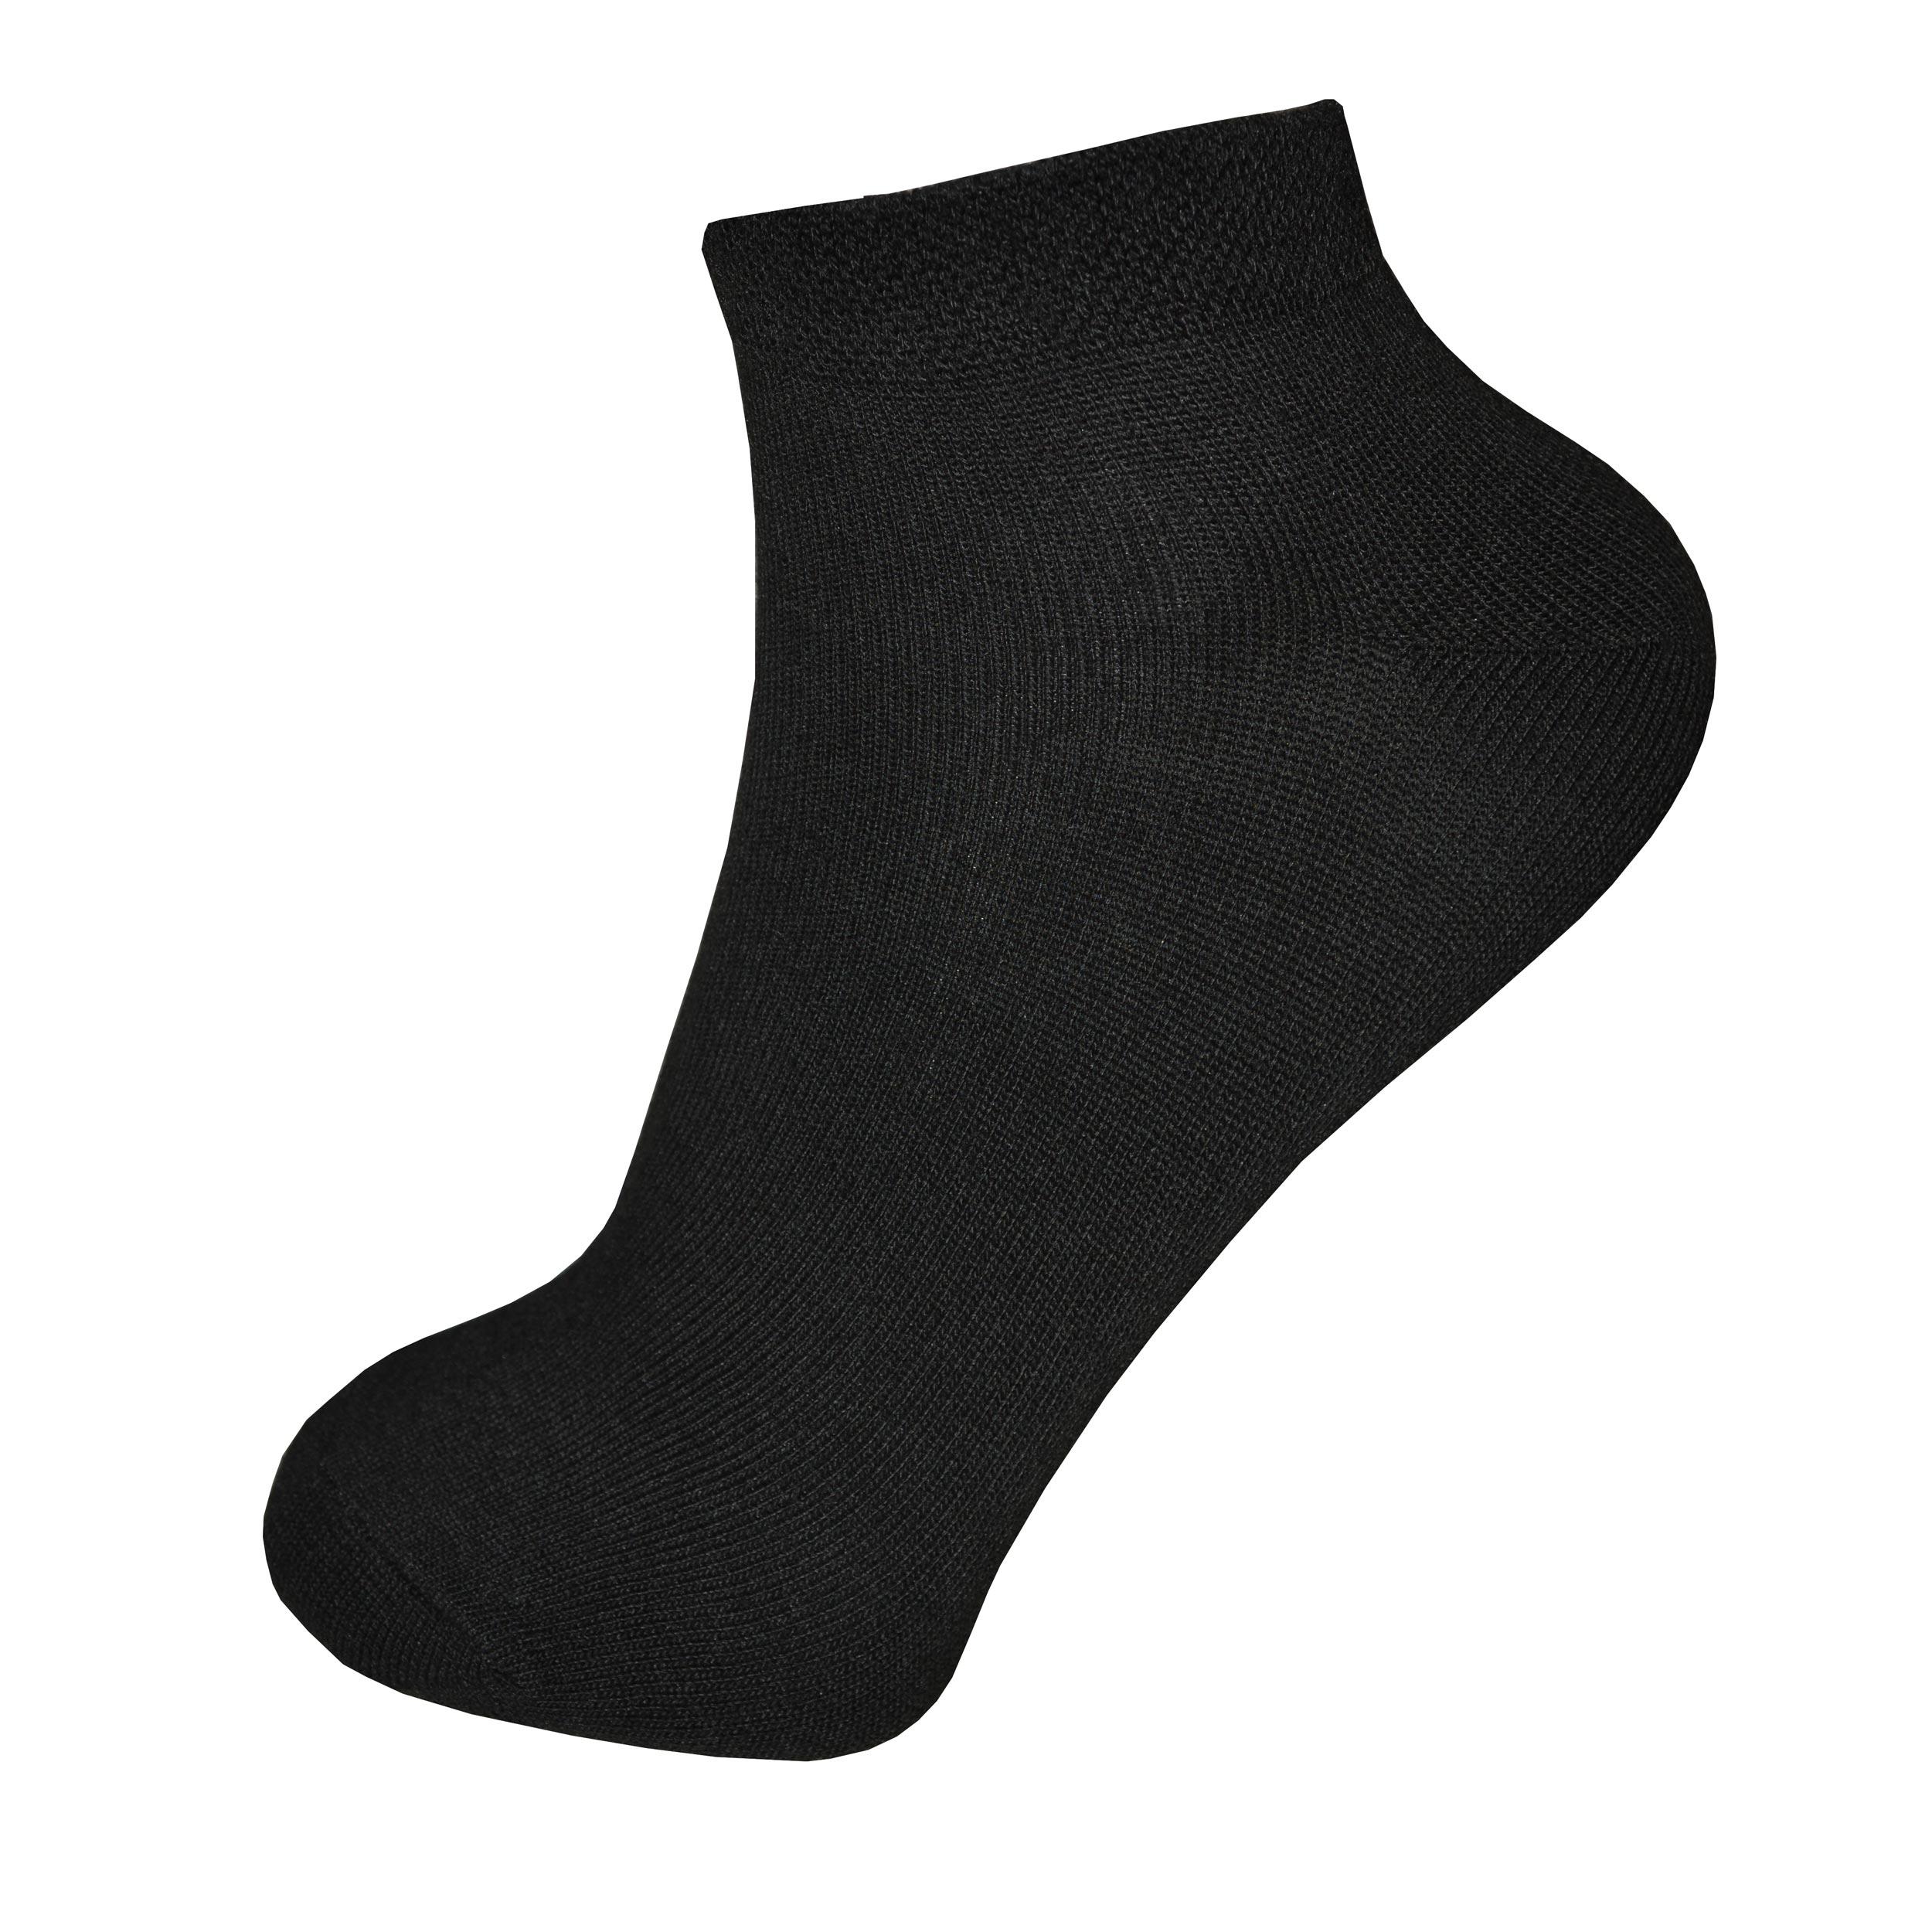 جوراب زنانه آکام کد 33 بسته 6 عددی main 1 1